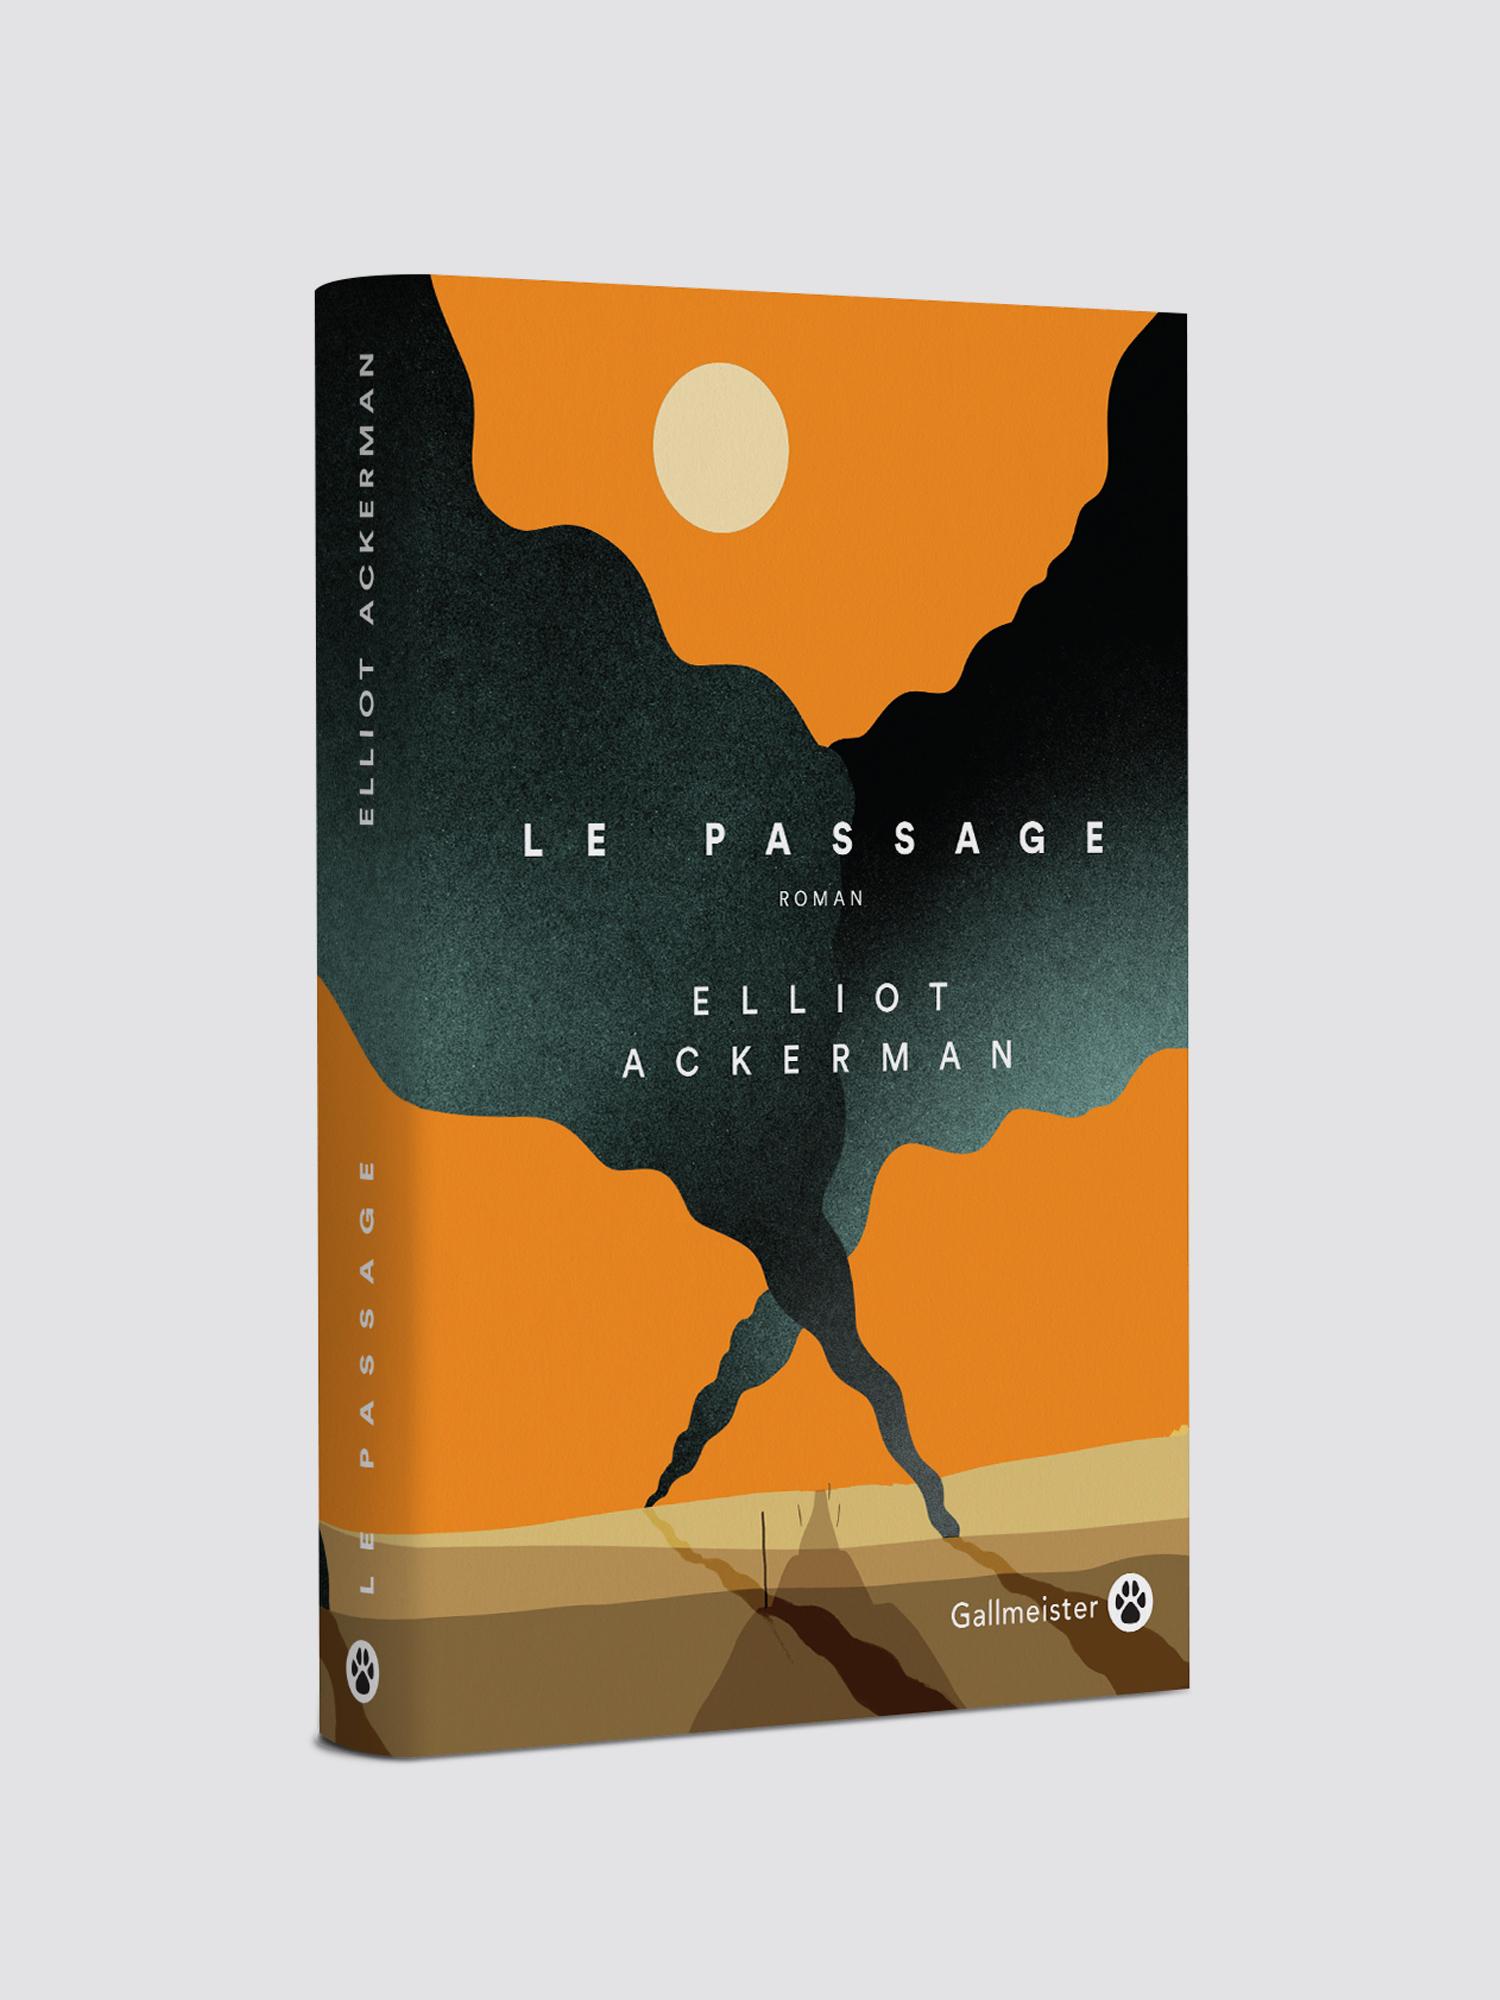 Le passage,Elliot Ackerman,aurelie bert,gallmeister,edition,boo design